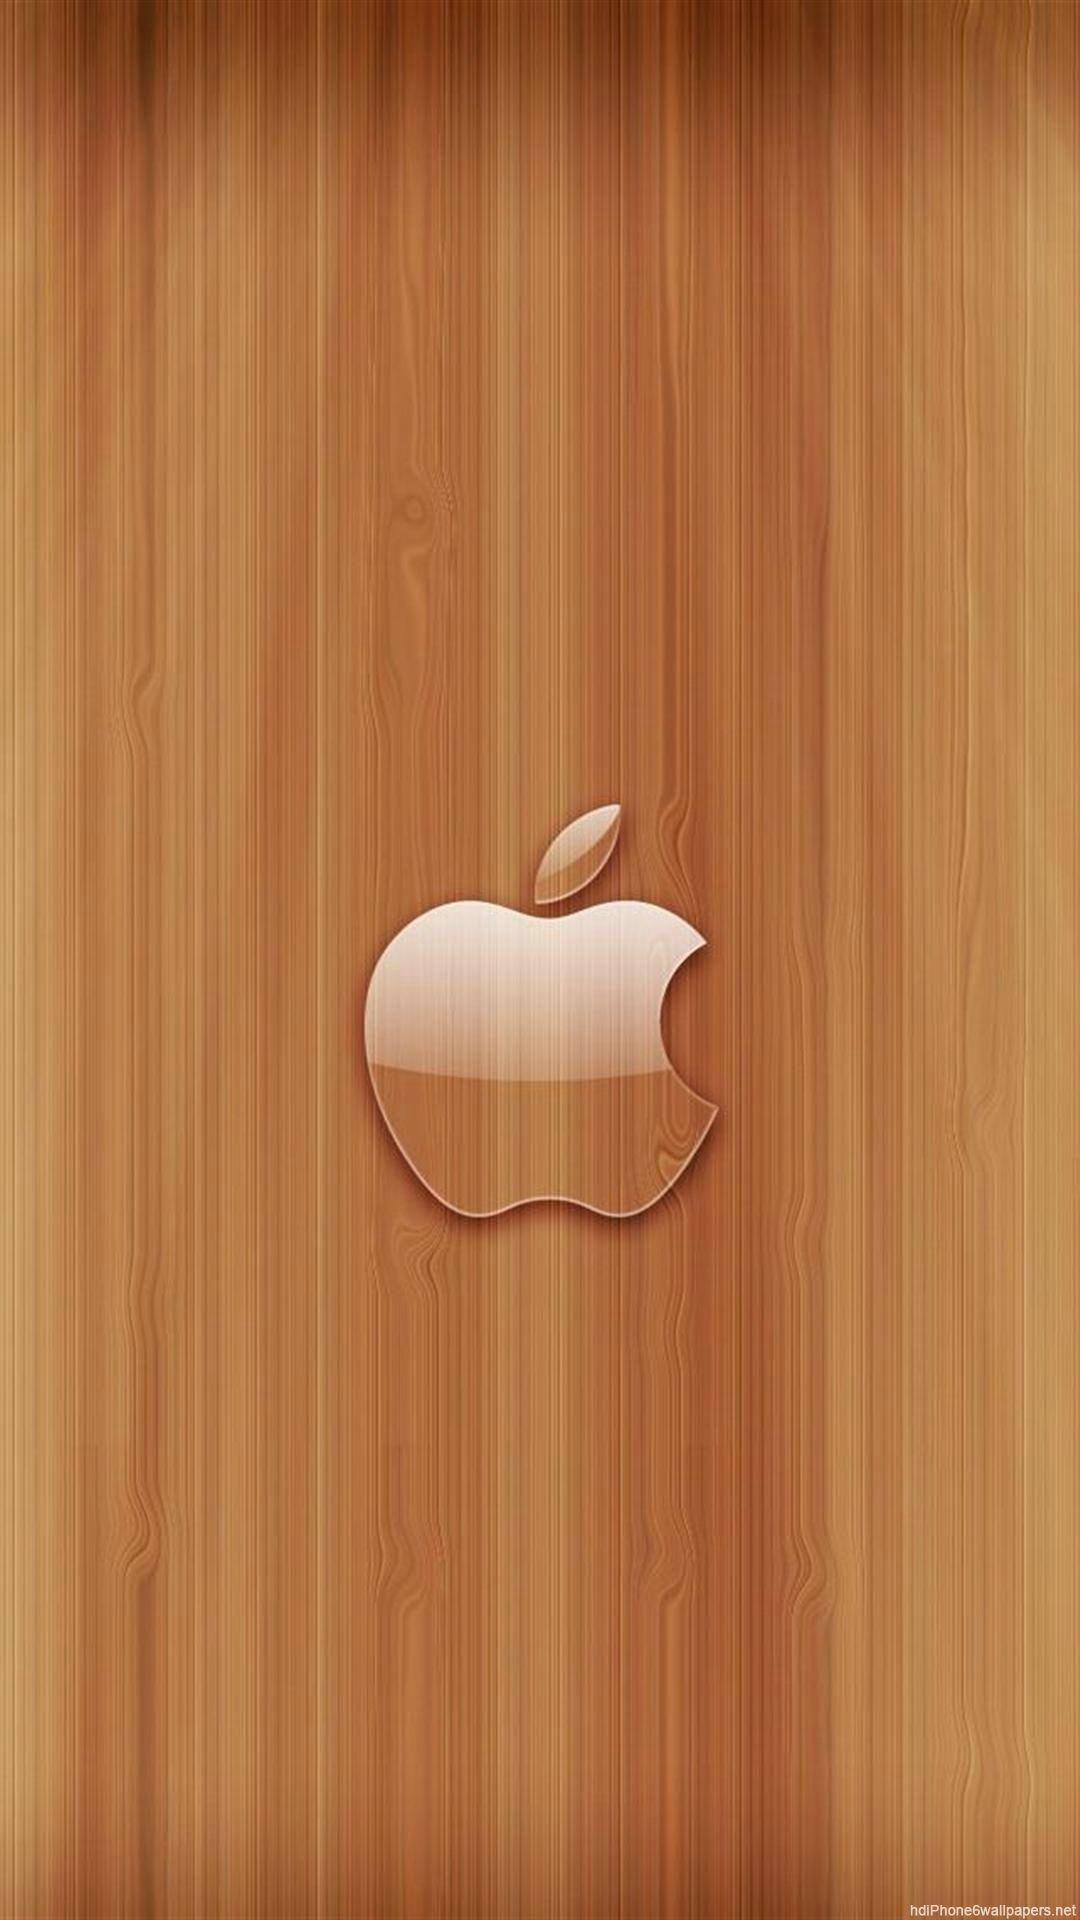 Iphone 6 Plus Wallpaper 1080p 92 Images